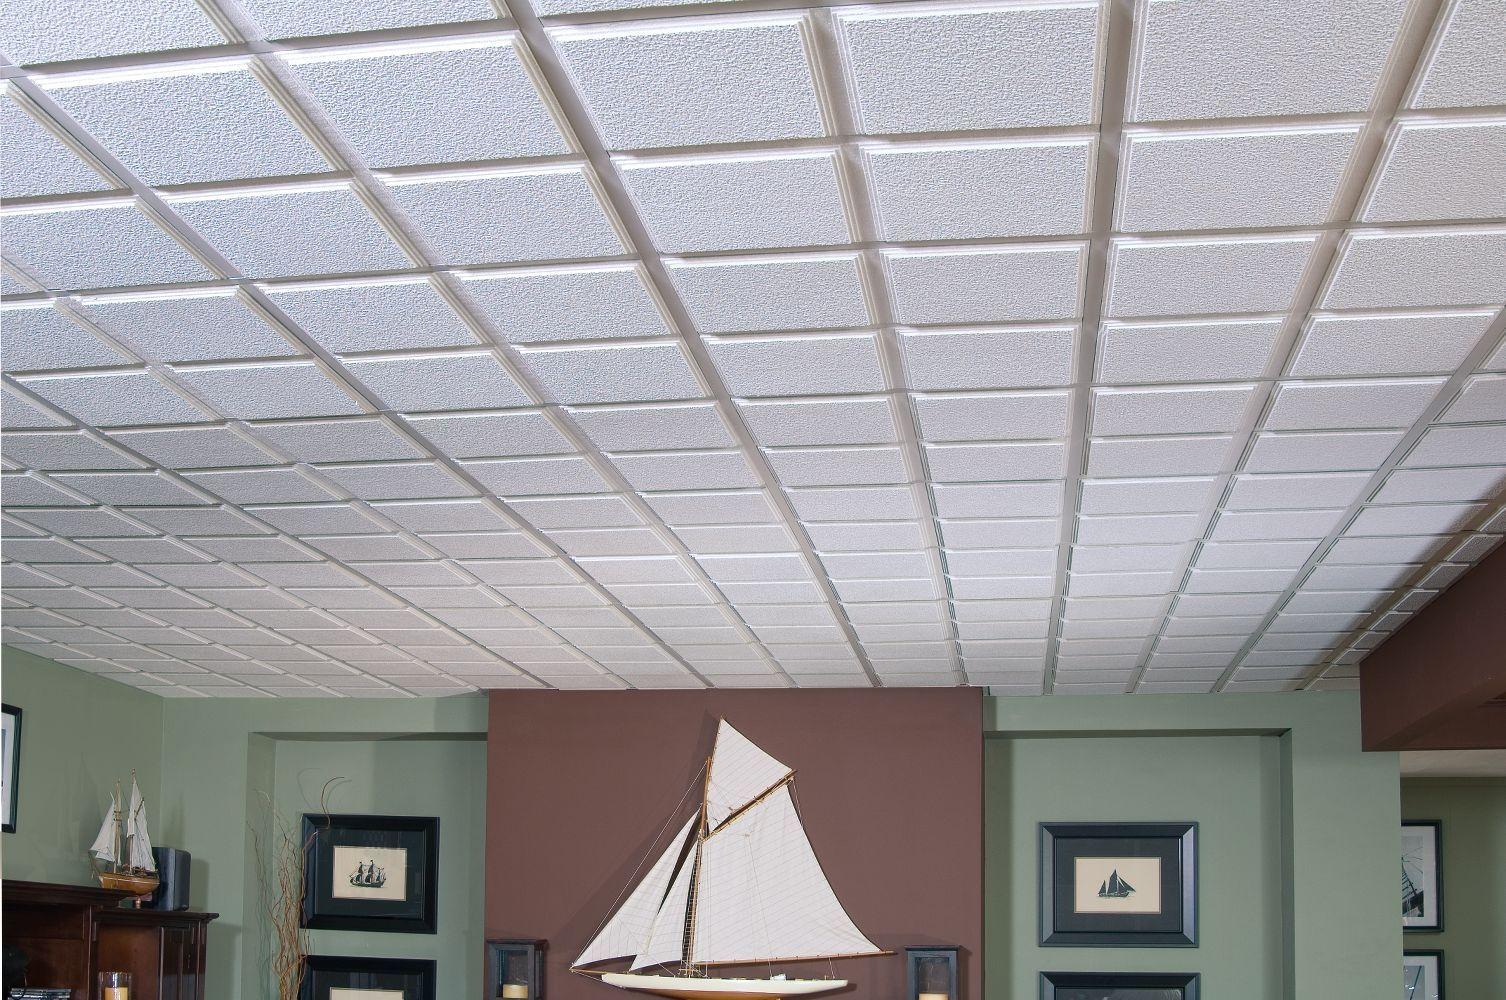 Fantastic 16X32 Ceiling Tiles Tiny 18 X 18 Ceramic Floor Tile Clean 2X2 Suspended Ceiling Tiles 2X4 Drop Ceiling Tiles Home Depot Young 3D Tile Backsplash Soft3X6 White Subway Tile Creativechairsandtables ..